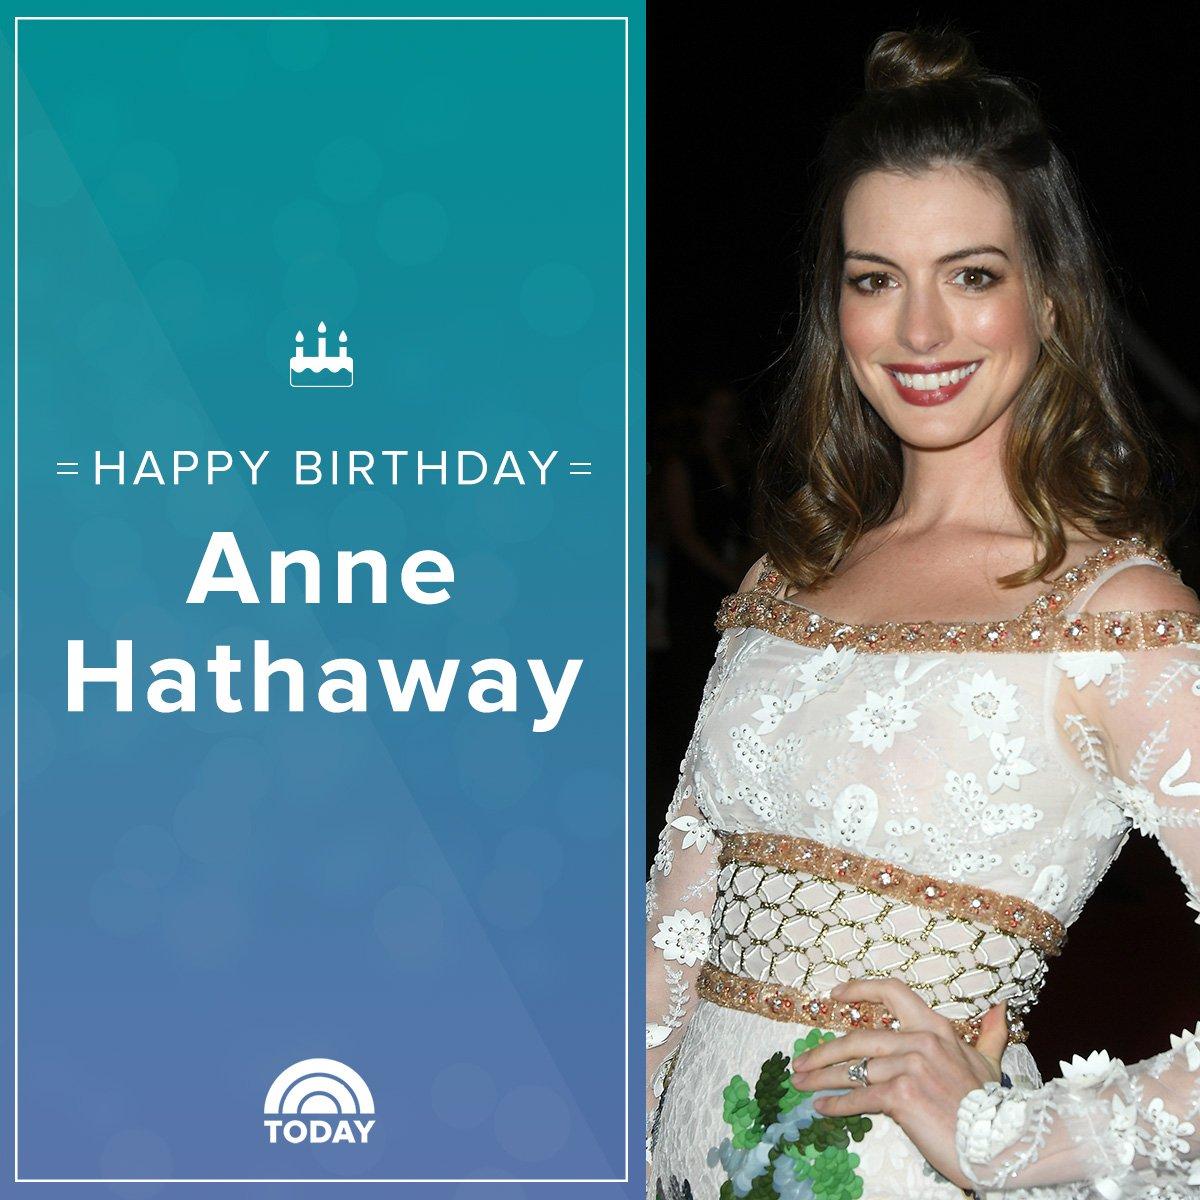 Anne Hathaway Now: Happy Birthday Anne Hathaway : Latest News, Breaking News